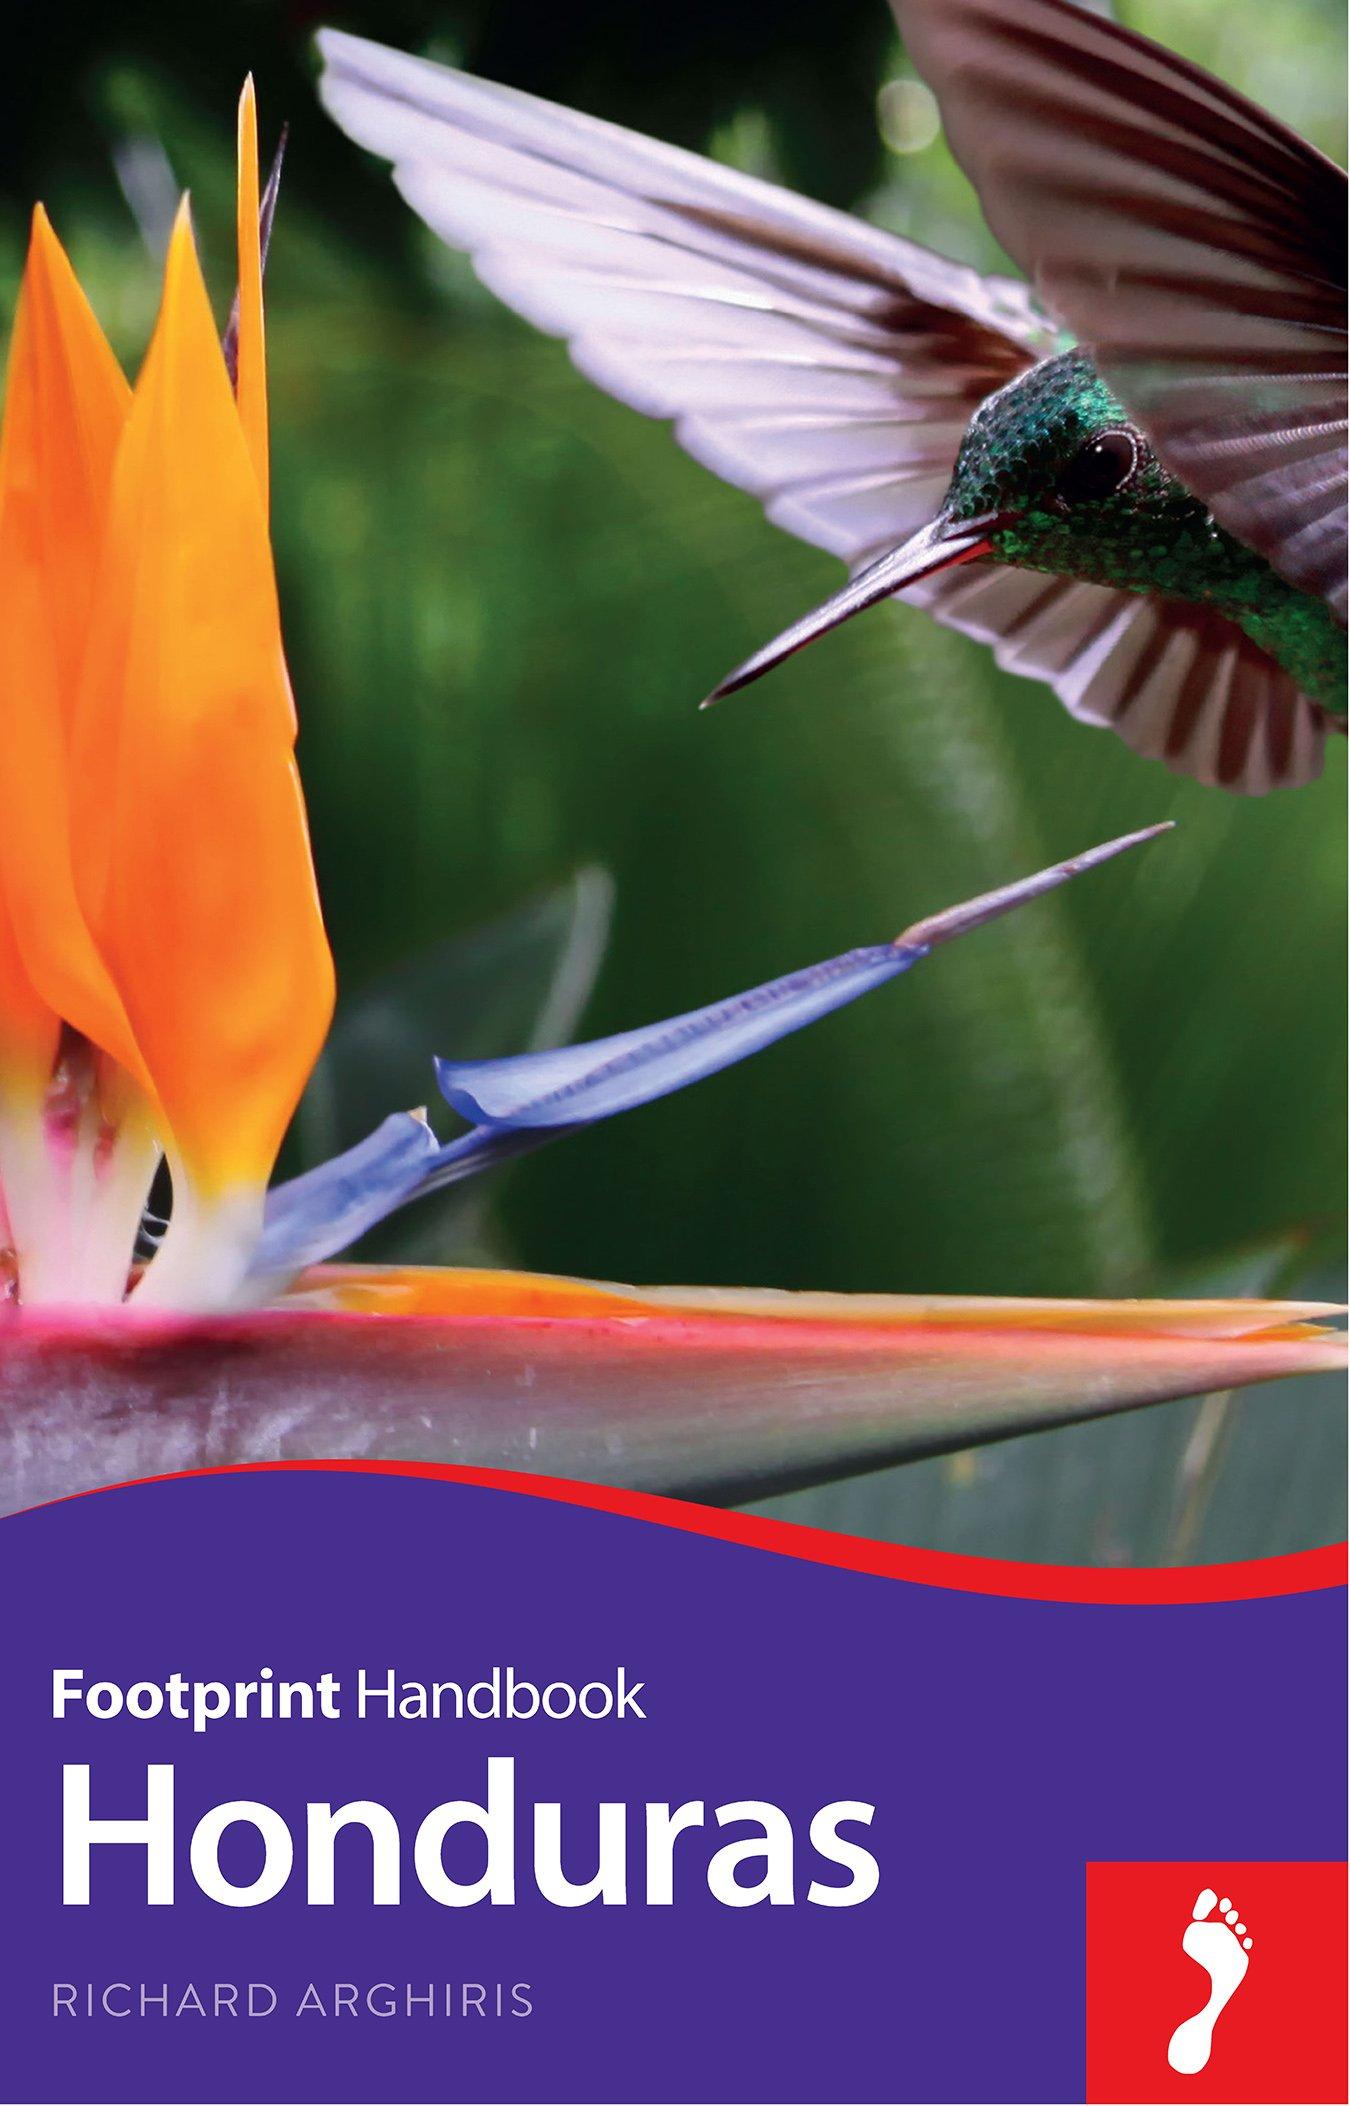 Honduras Handbook Footprint Richard Arghiris product image